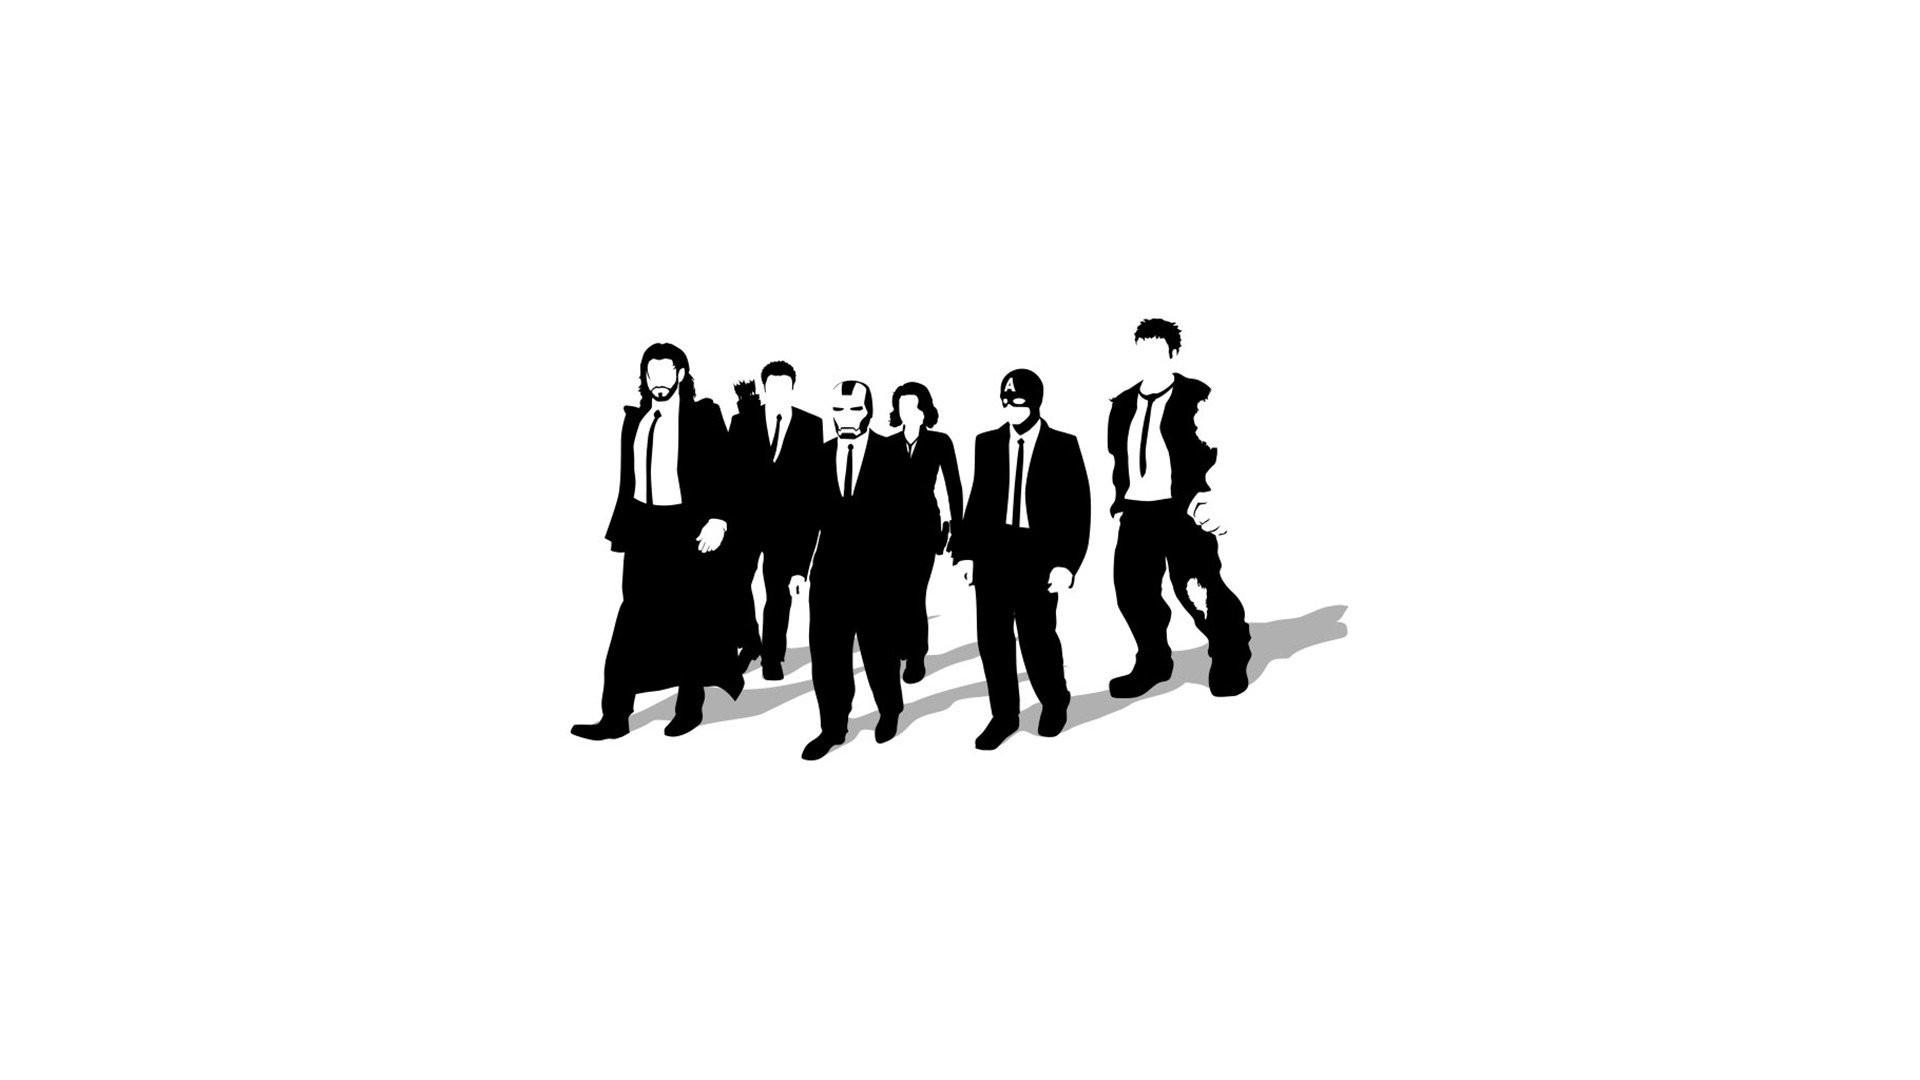 Minimalistic Reservoir Dogs artwork simple background Avengers wallpaper      261655   WallpaperUP